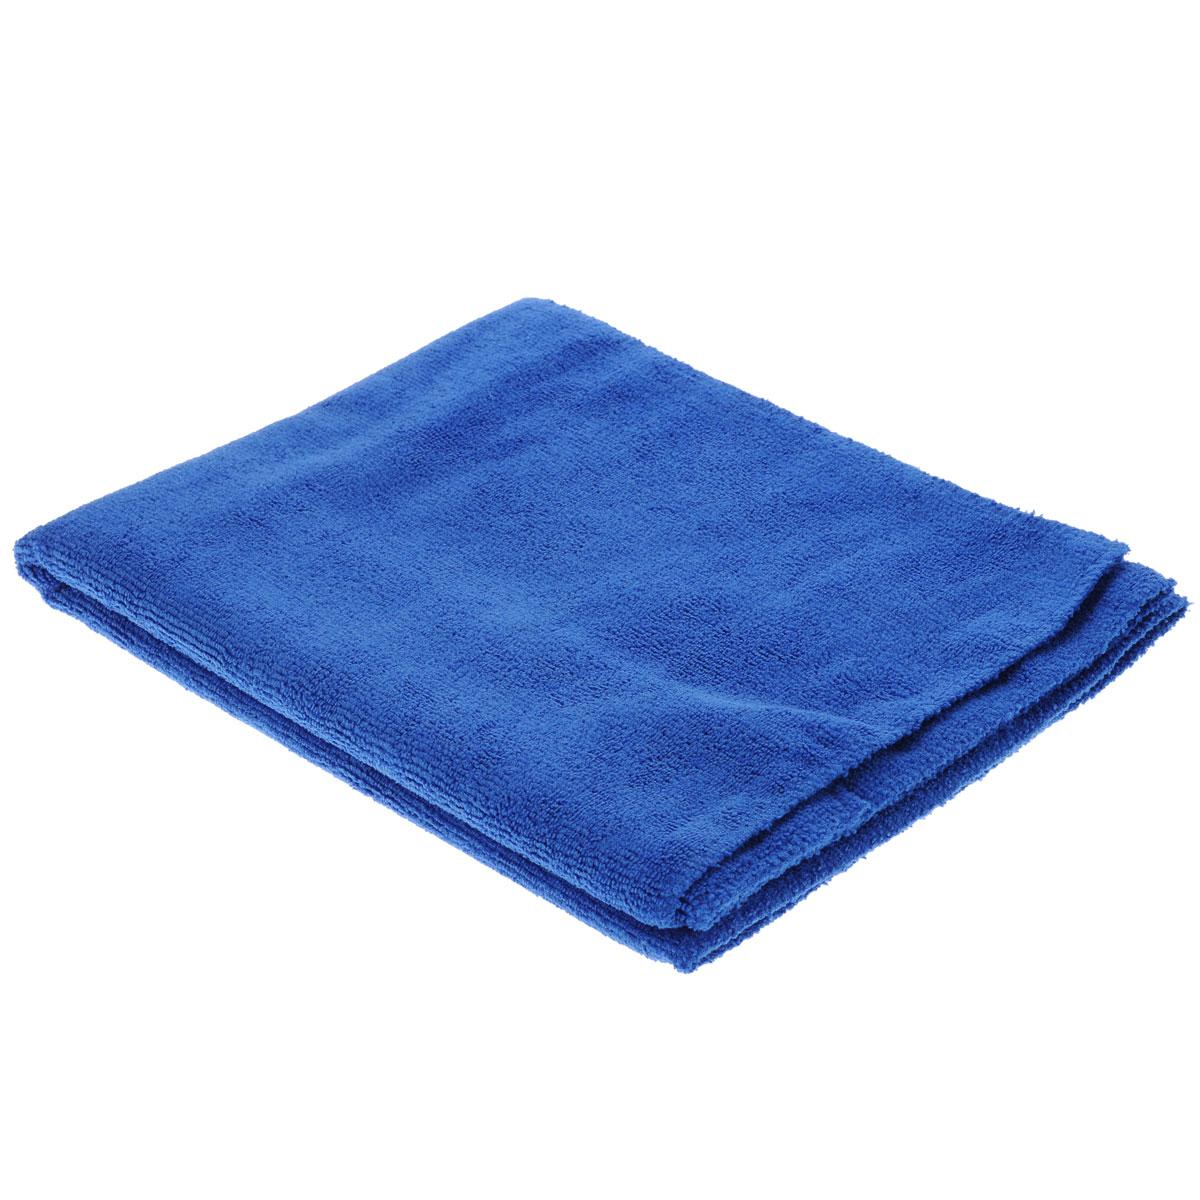 "Тряпка для пола ""Eva"", цвет: синий, 75 х 60 см"